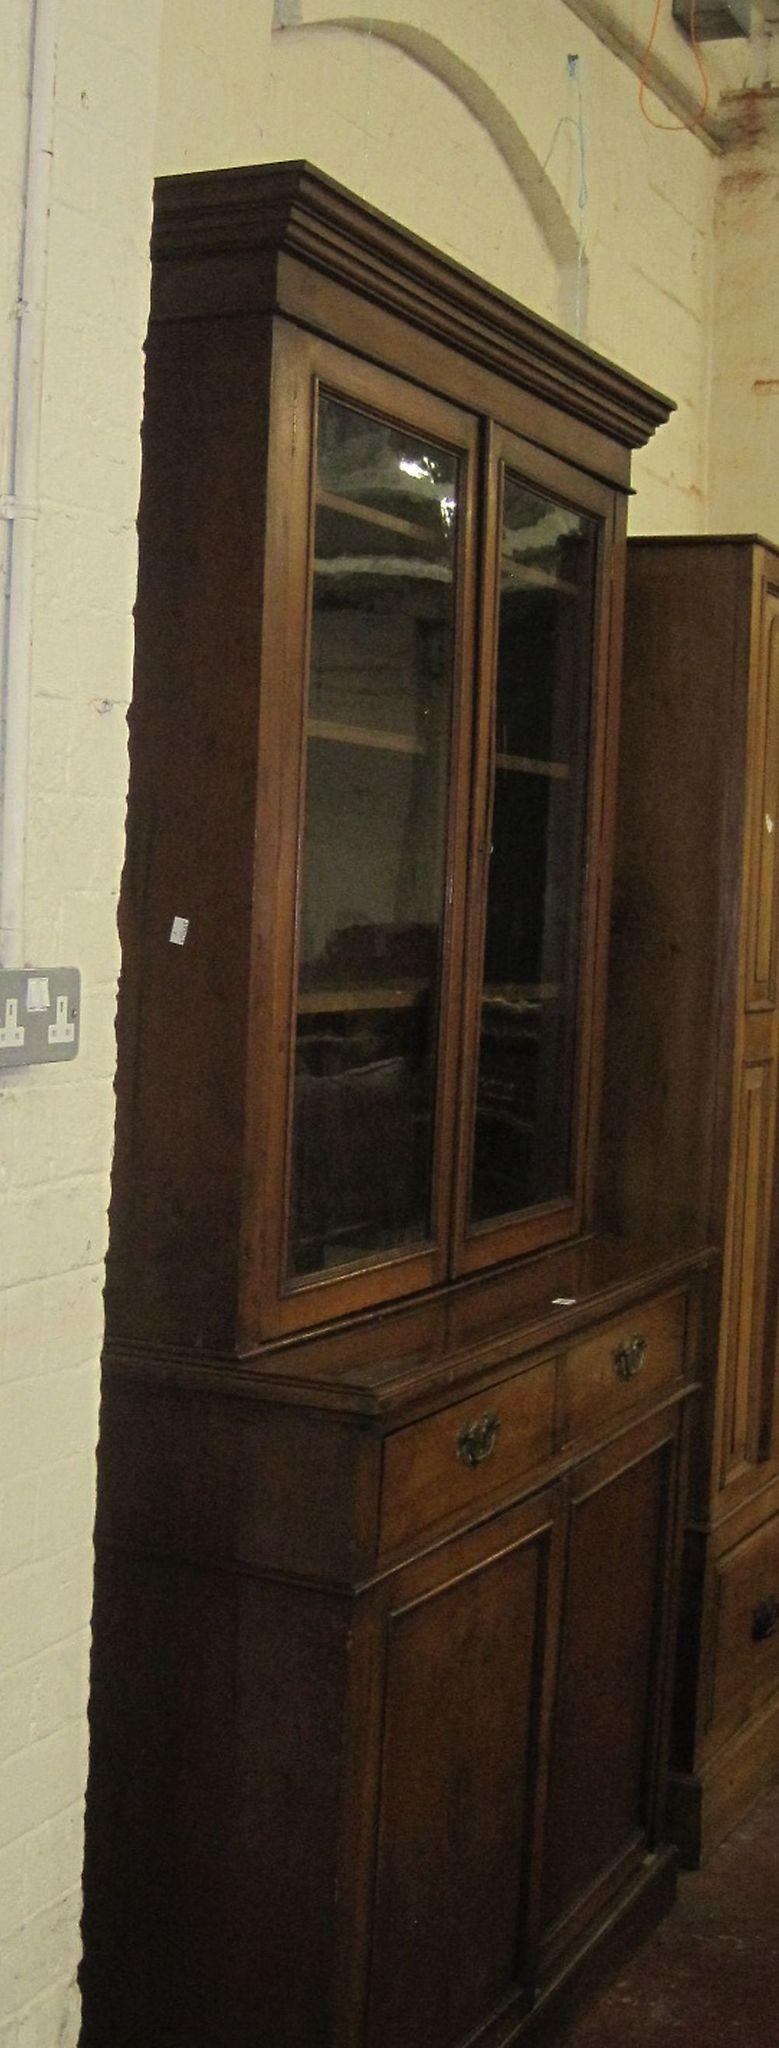 A late 19th Century mahogany bookcase/cabinet